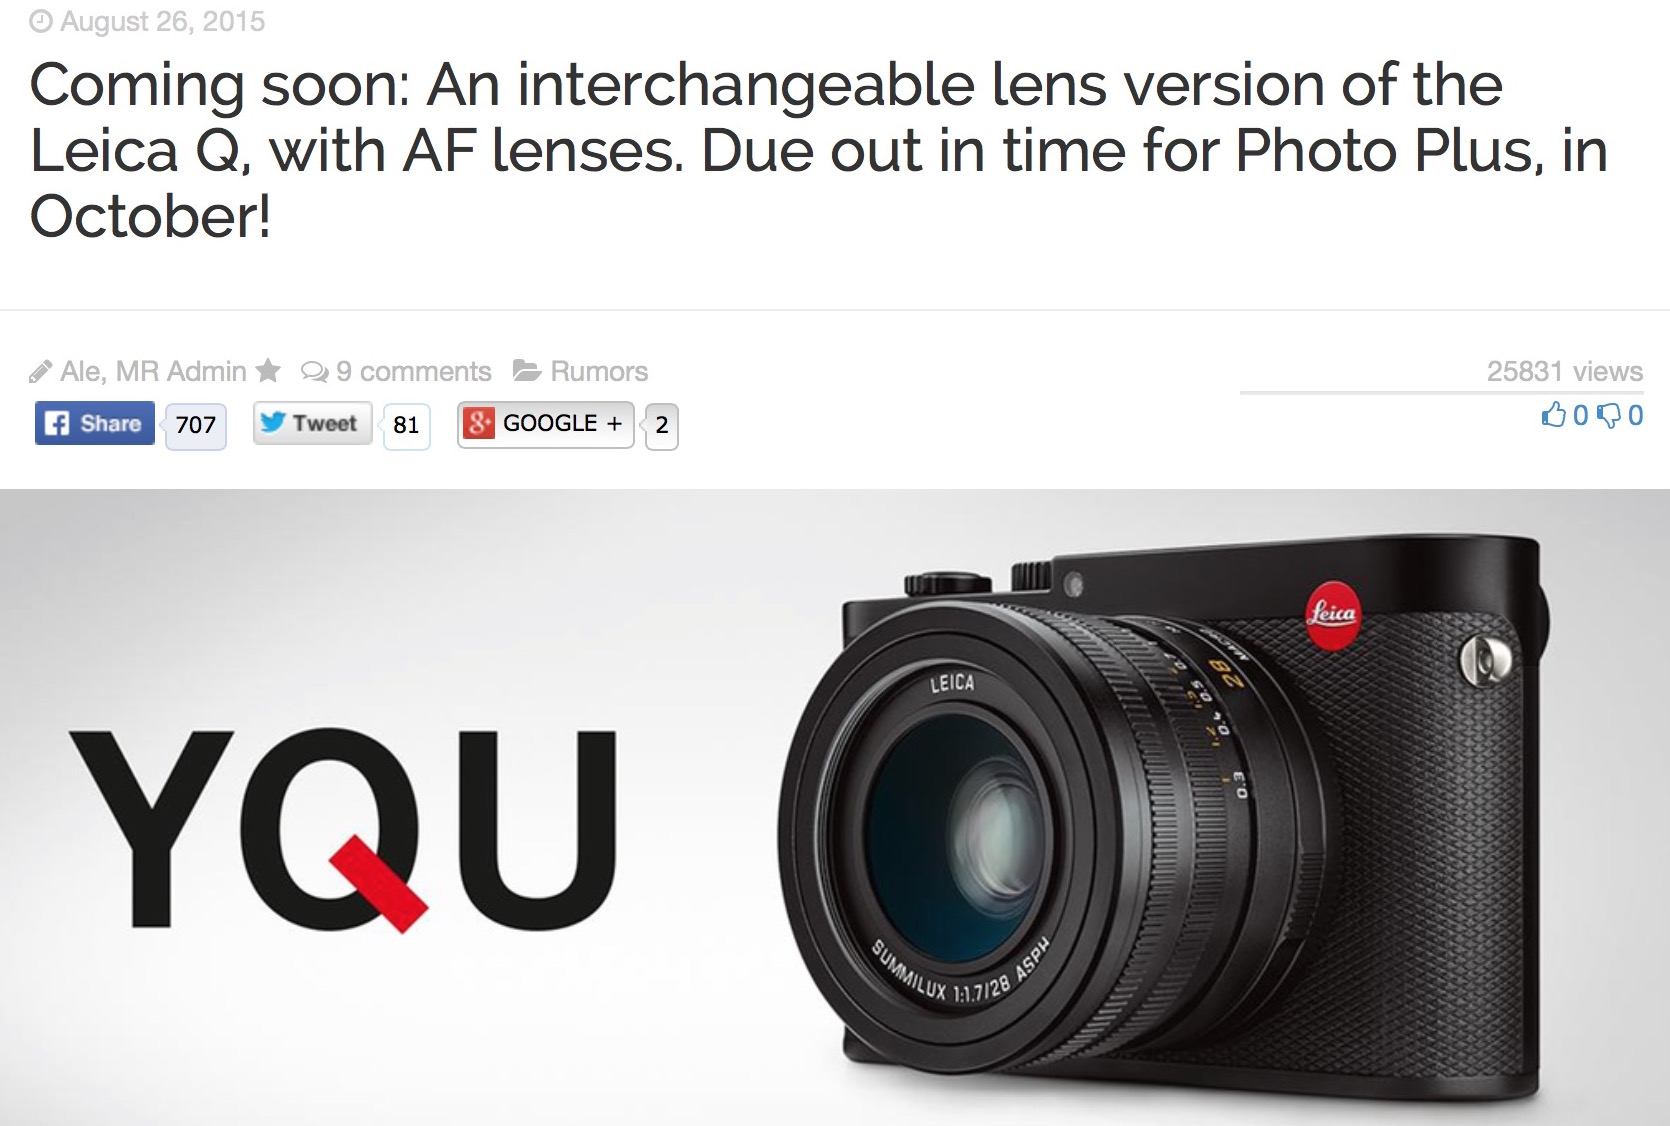 Full Frame Leica with Panasonic Technology